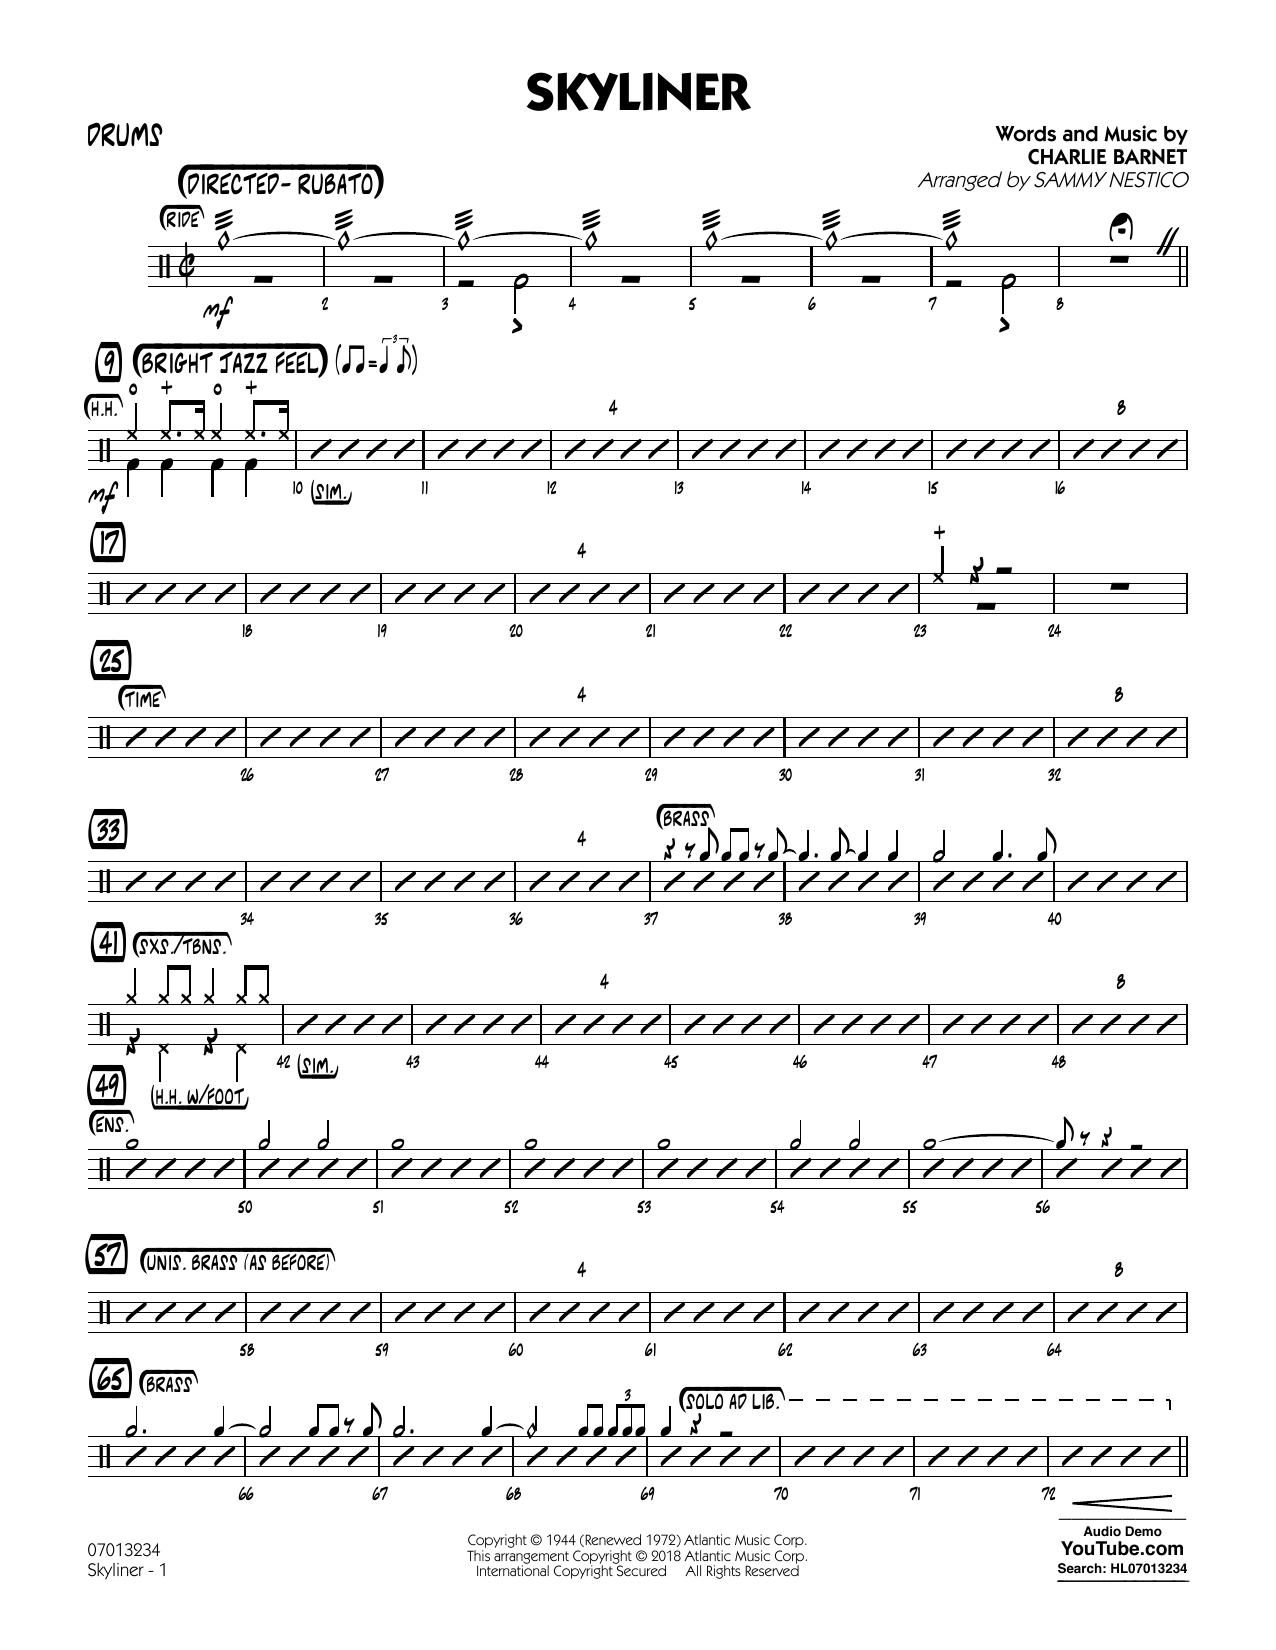 Charlie Barnet Skyliner (arr. Sammy Nestico) - Drums sheet music notes and chords. Download Printable PDF.